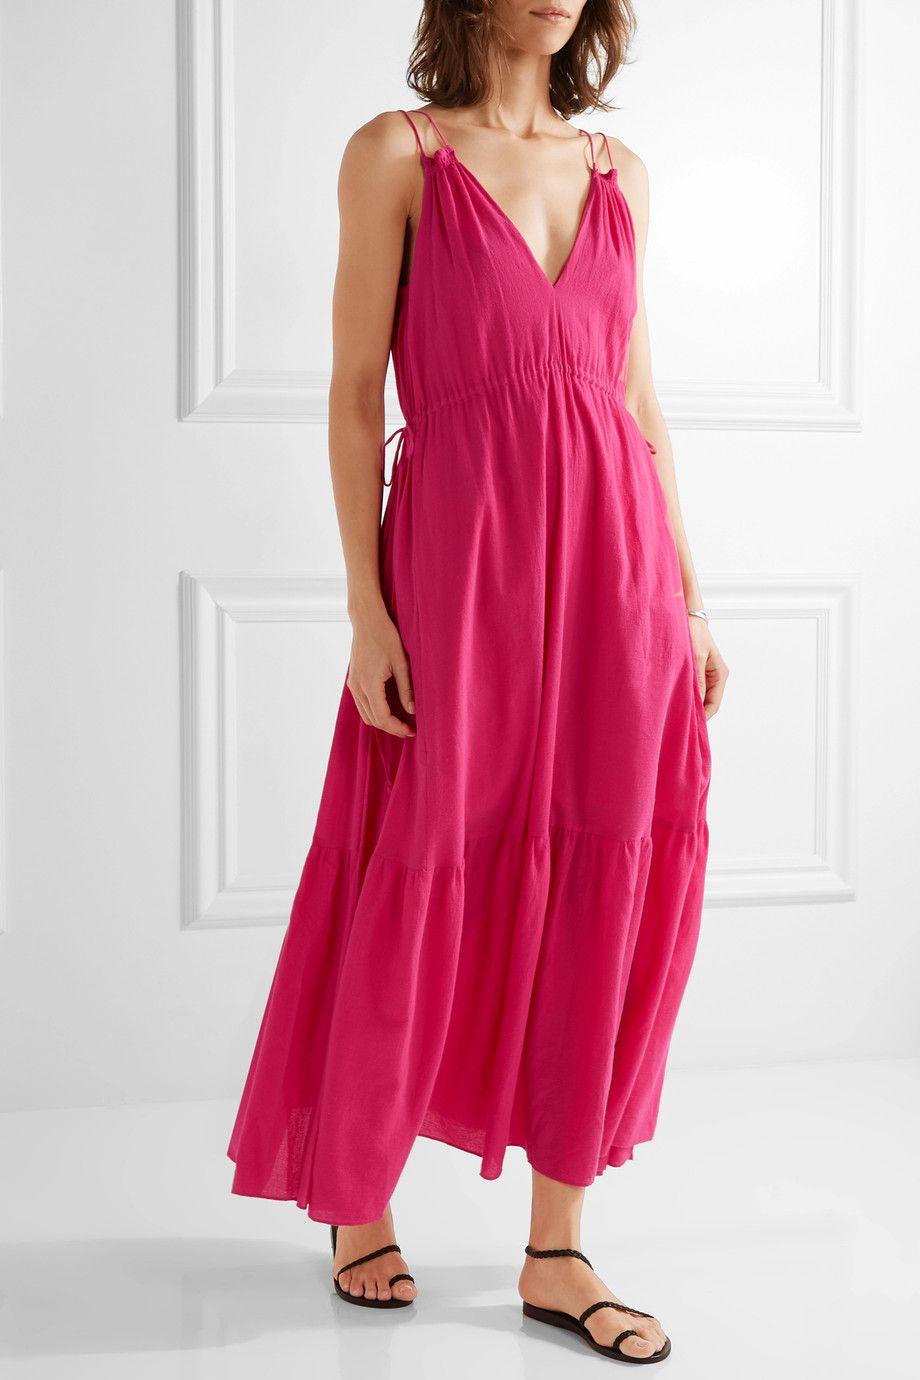 Apiece Apart Daphne Cotton Crepon Maxi Dress Net A Porter Com Dresses Daphne Dress Maxi Dress [ 1380 x 920 Pixel ]